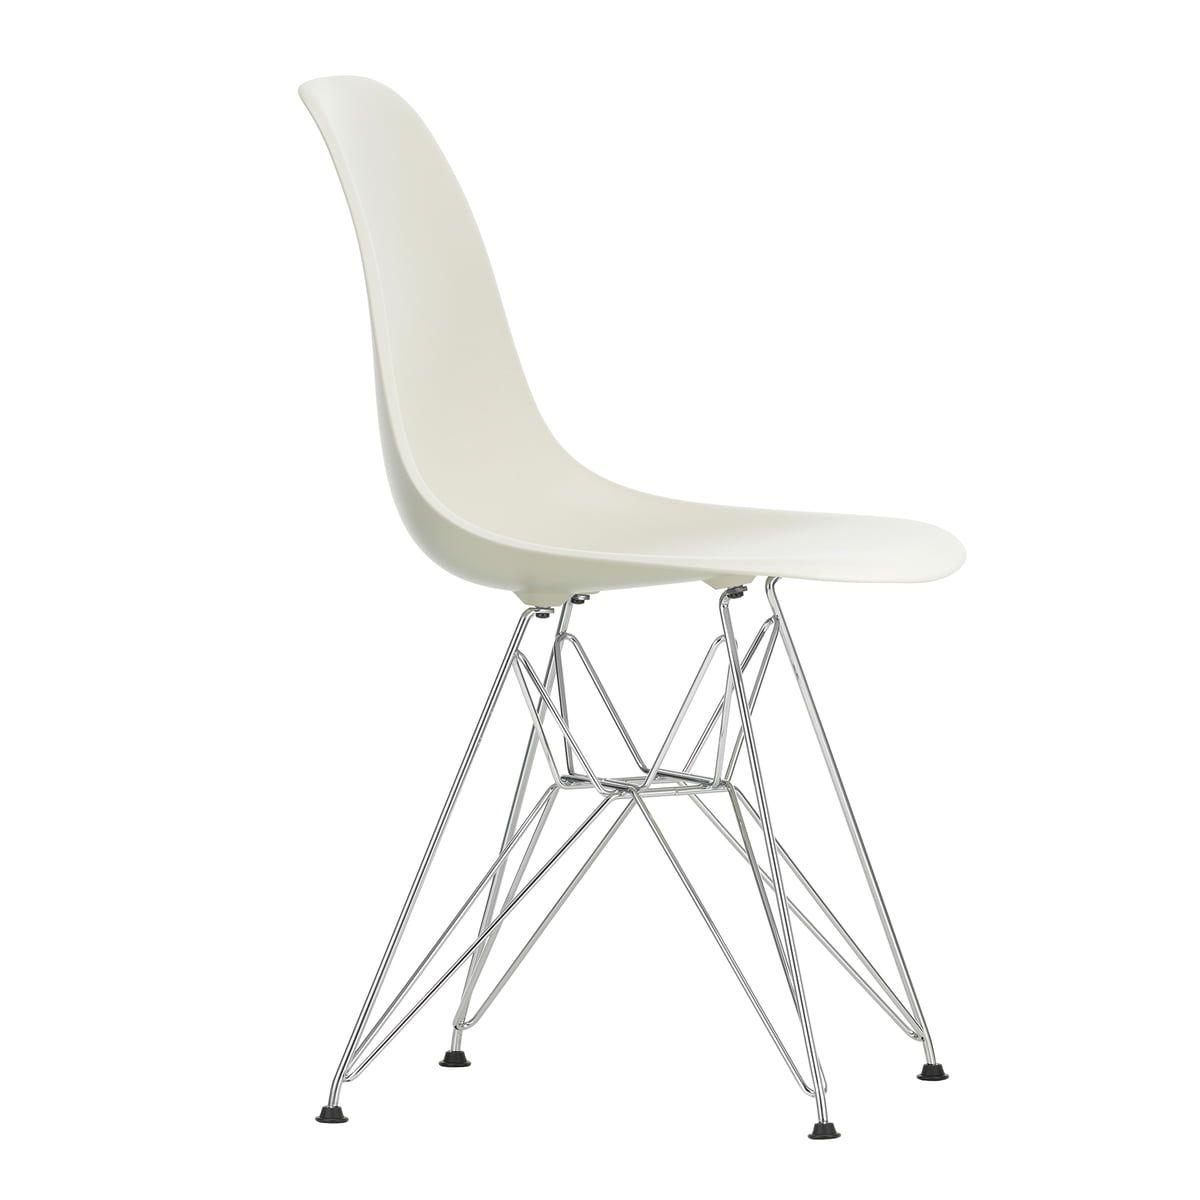 Vitra Eames Plastic Side Chair Dsr Verchromt Kieselstein Filzgleiter Basic Dark In 2020 Chair Eames Furniture